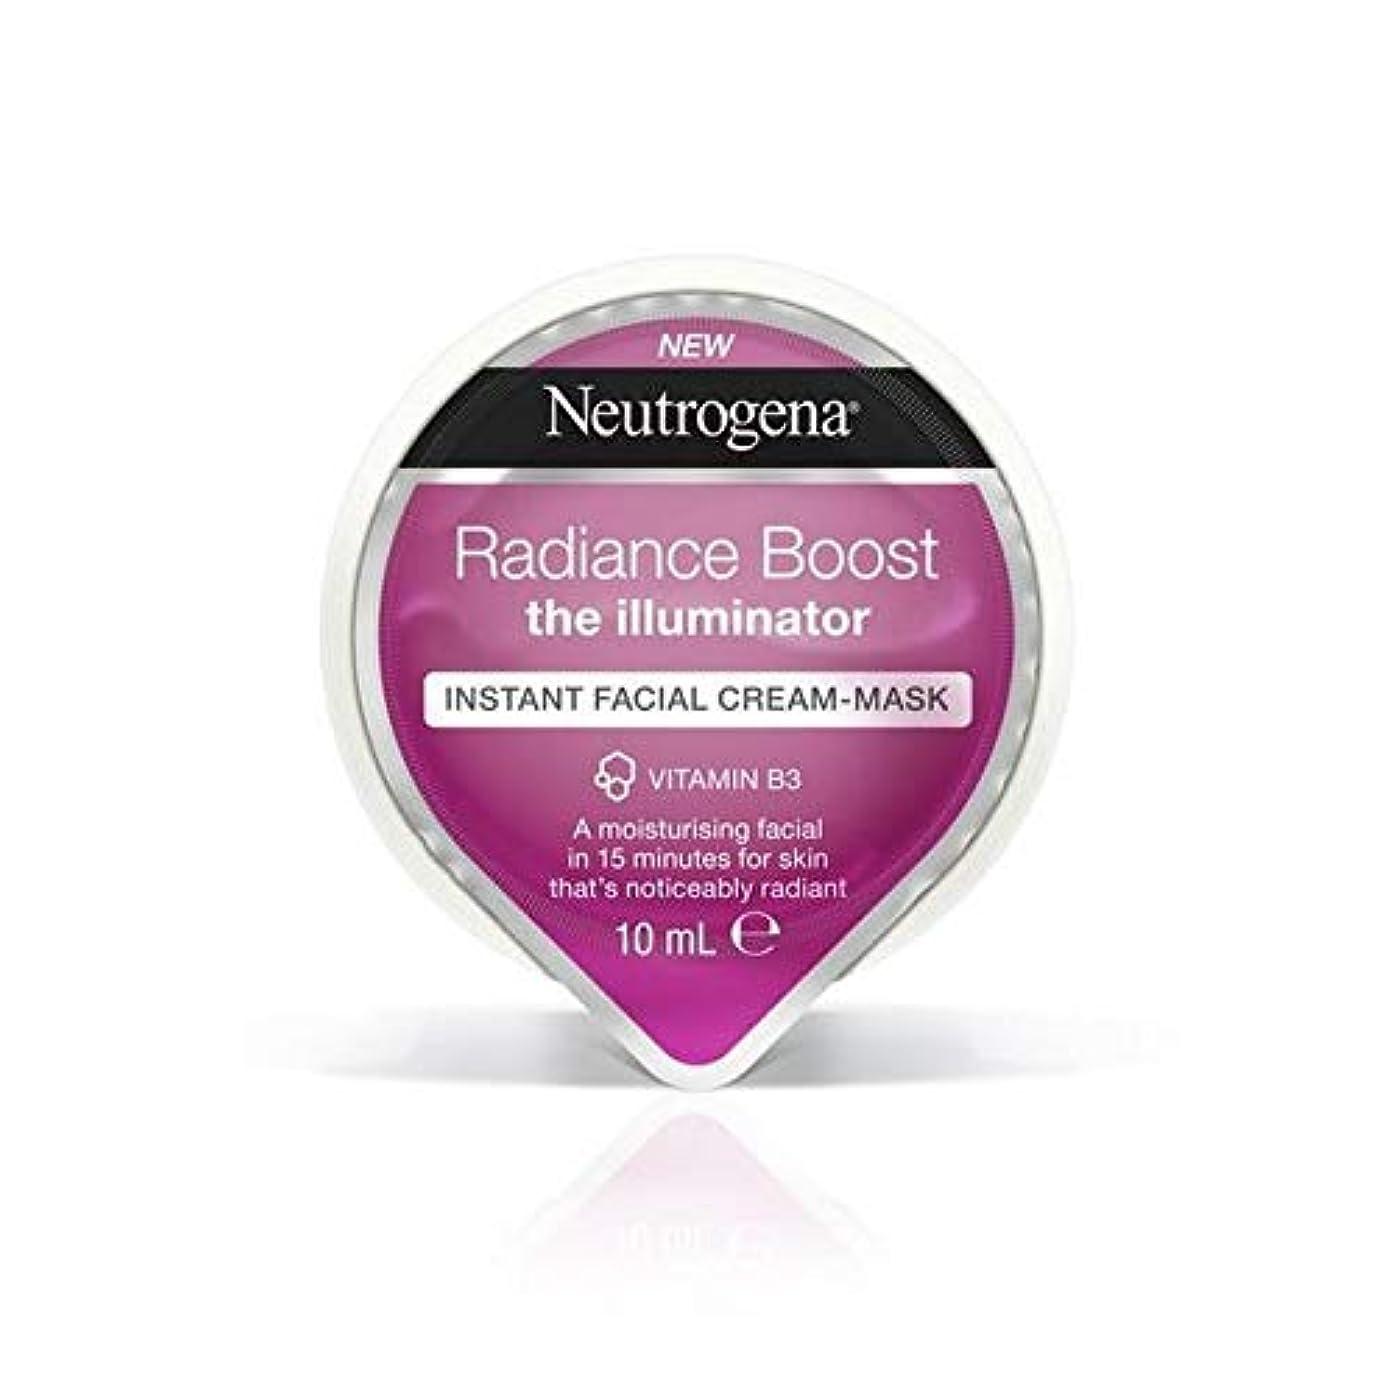 [Neutrogena] ニュートロジーナの放射輝度ブーストインスタントフェイシャルクリームマスク10ミリリットル - Neutrogena Radiance Boost Instant Facial Cream Mask...